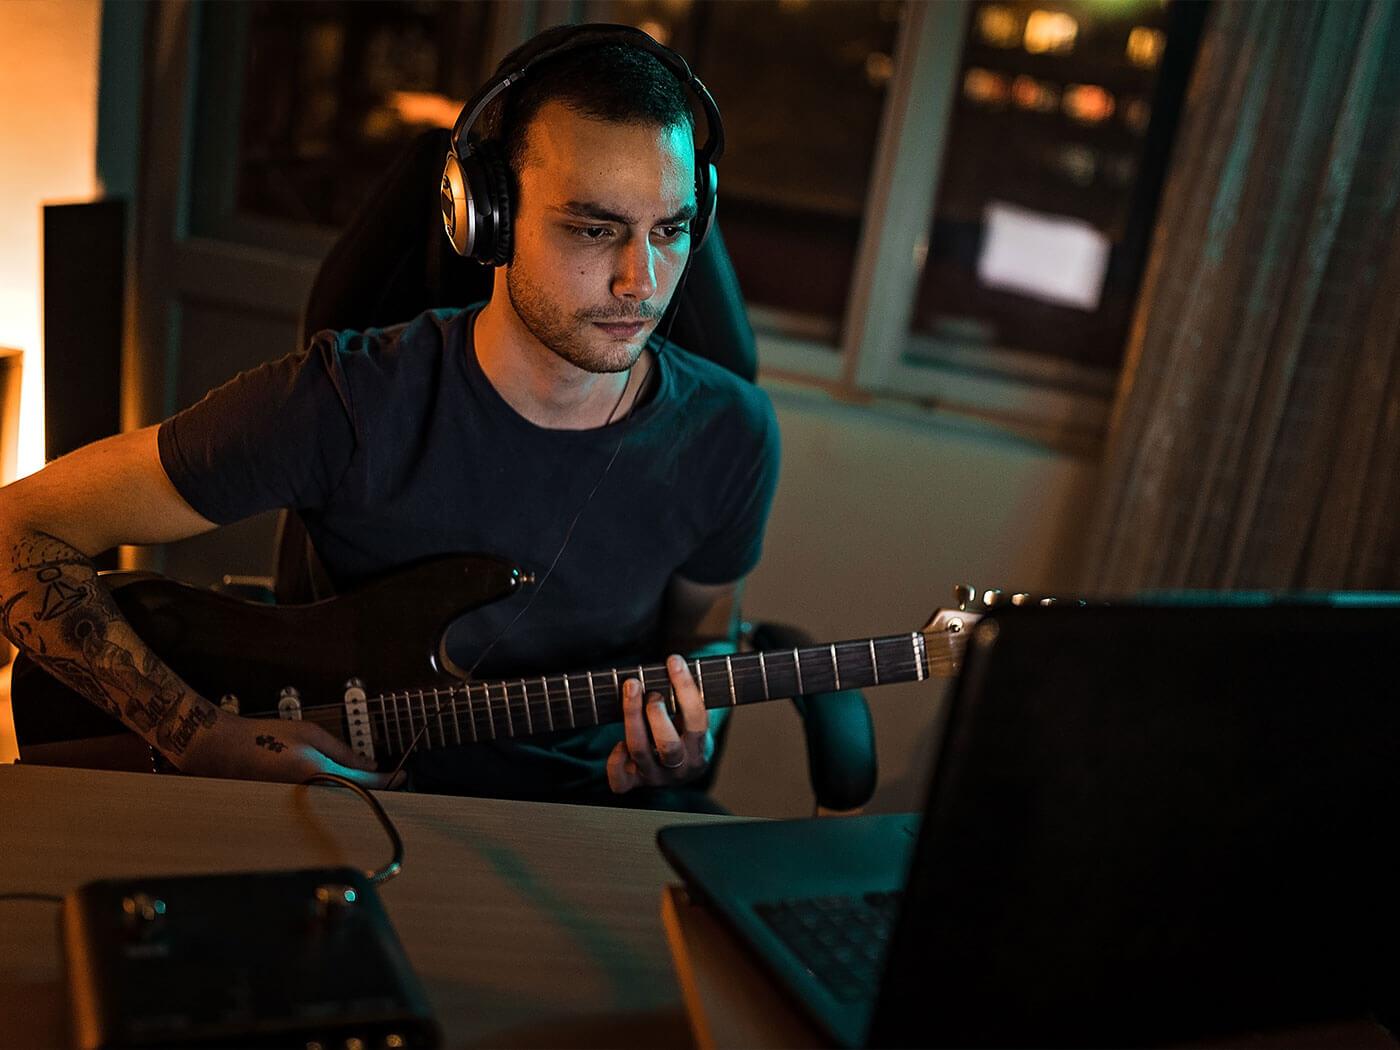 Someone recording guitar in a home studio.